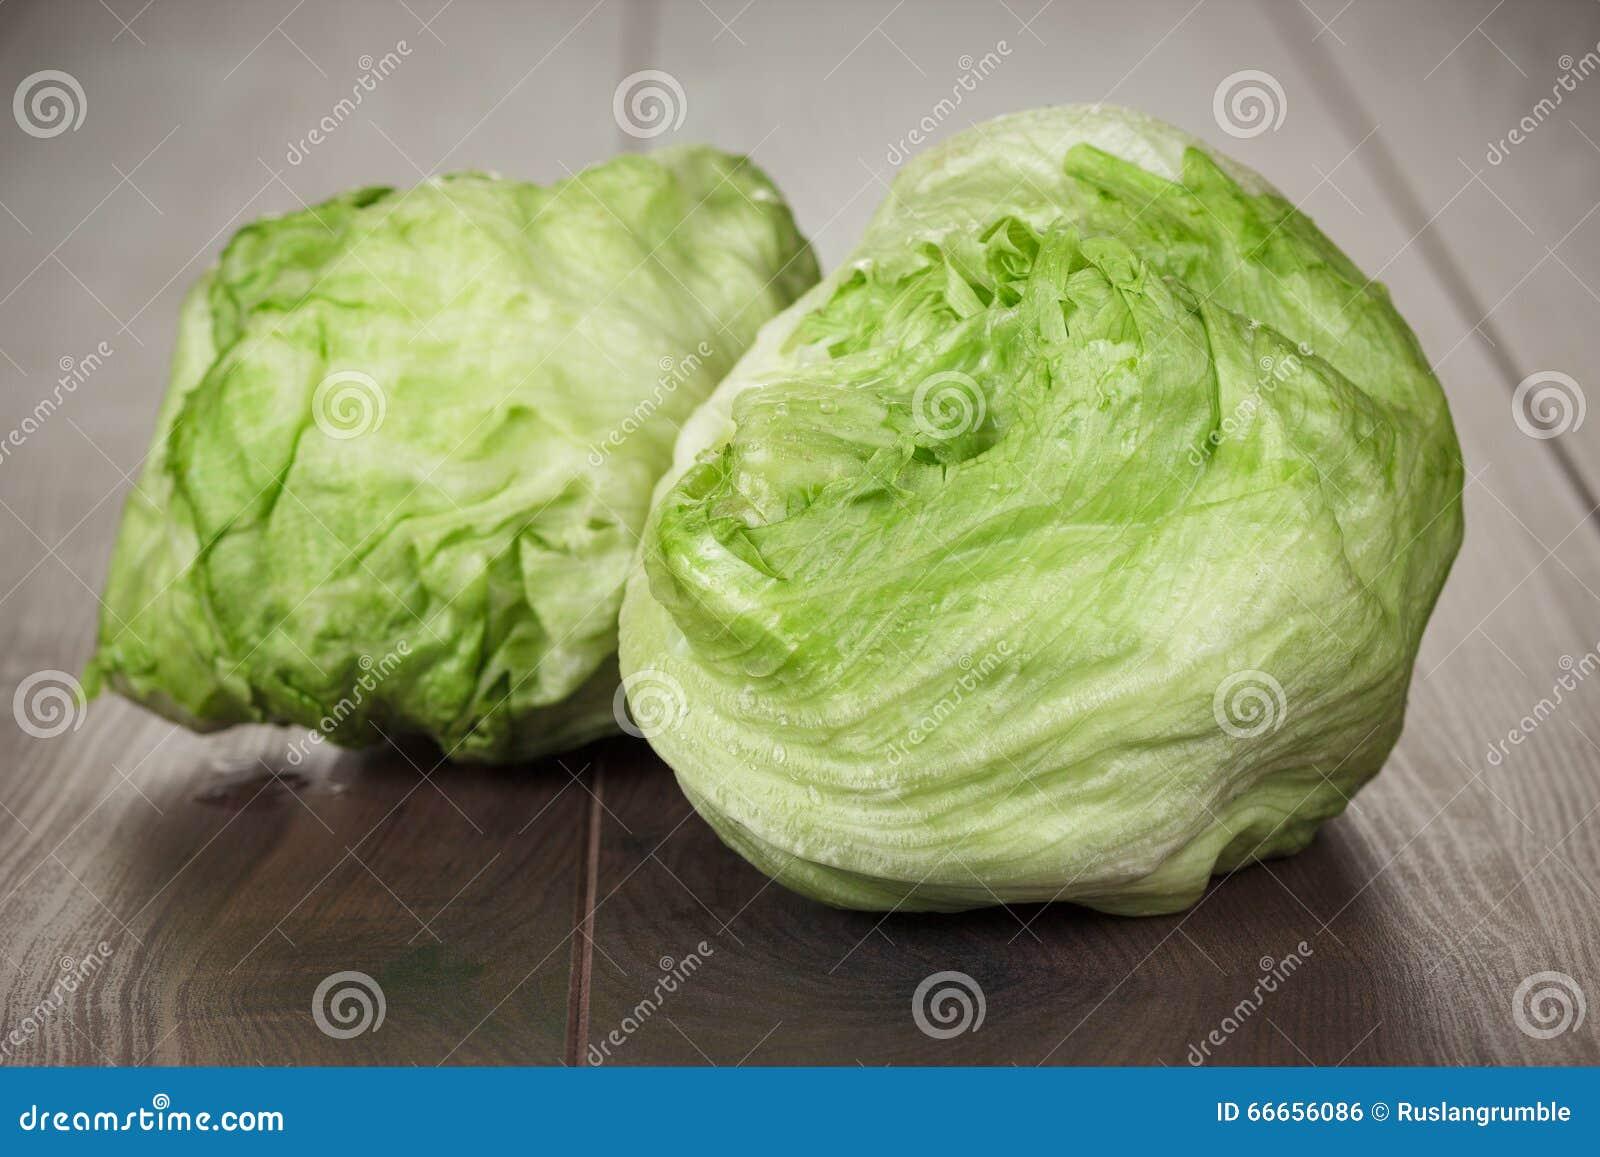 salade verte fraîche d'iceberg photo stock - image du ingrédient